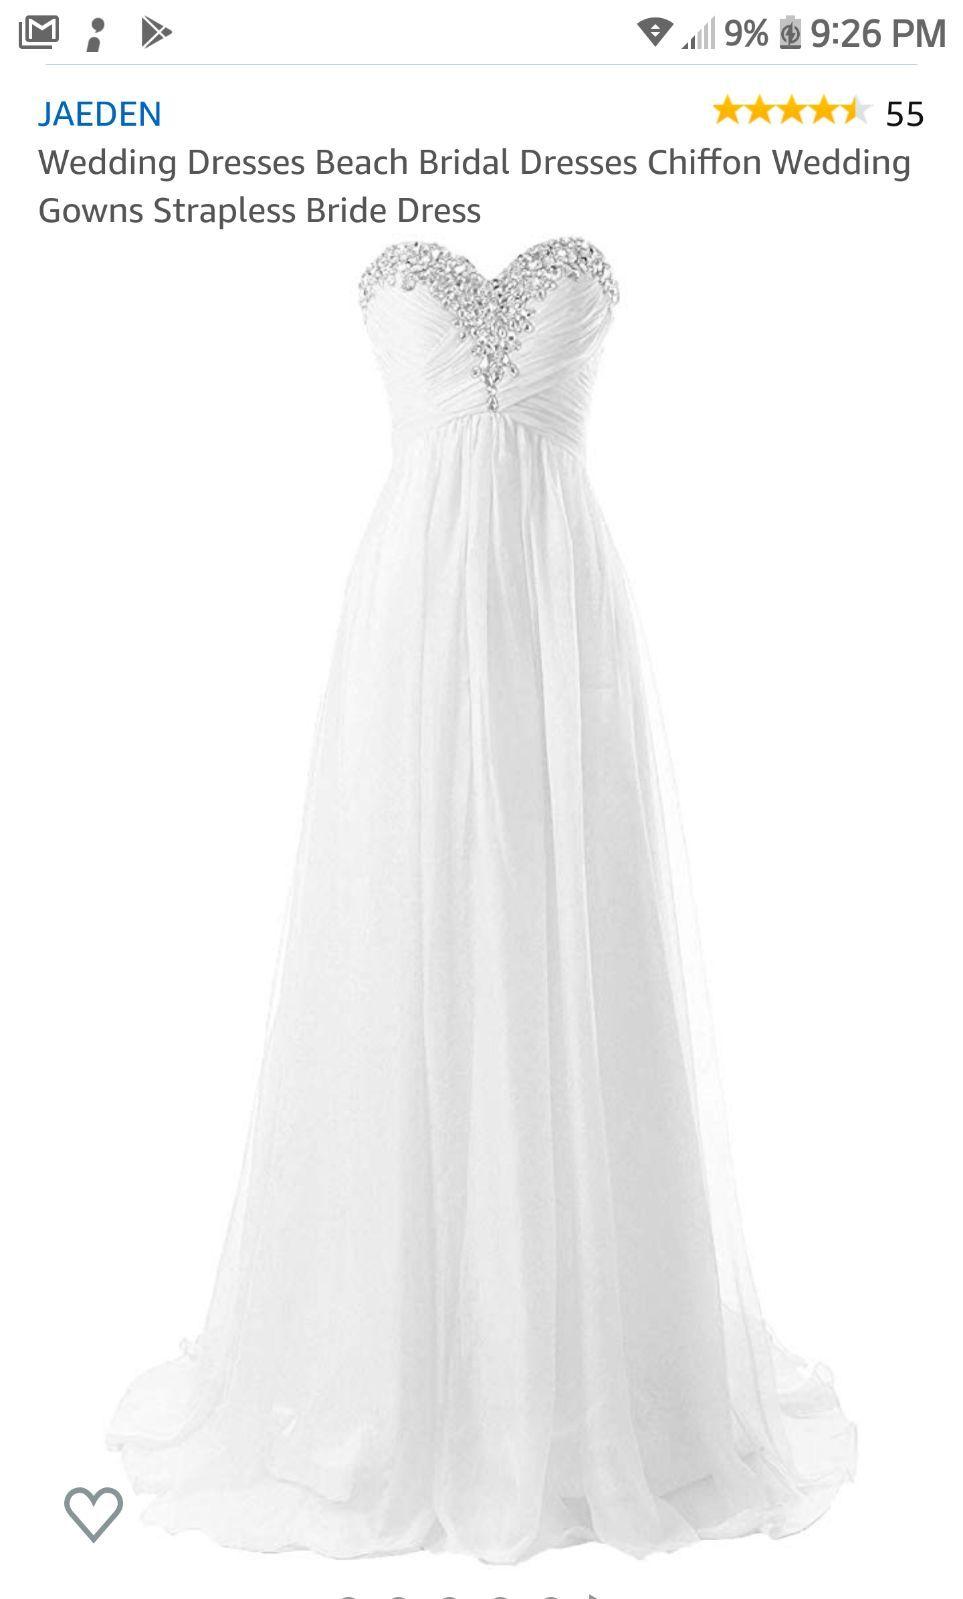 JAEDEN Wedding Dresses Beach Bridal Dresses Chiffon Wedding Gowns Strapless Bride Dress